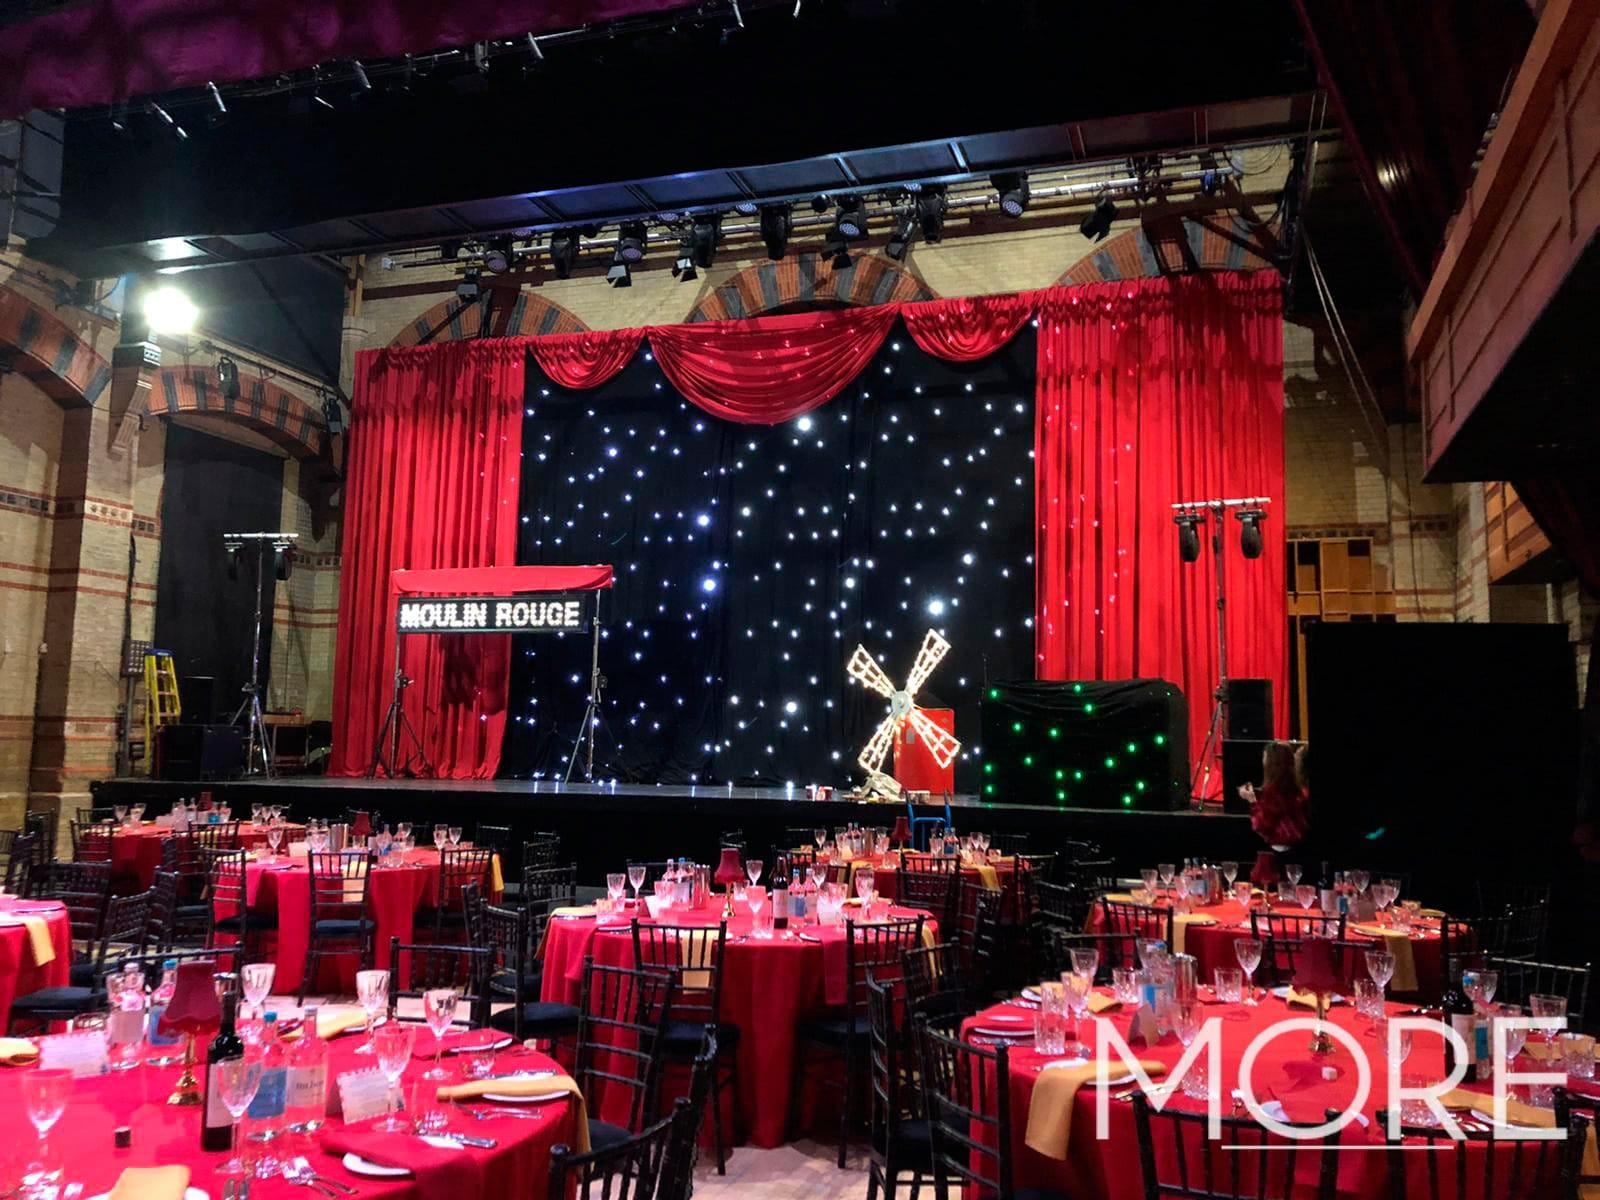 Moulin rouge starcloth backdrop drape